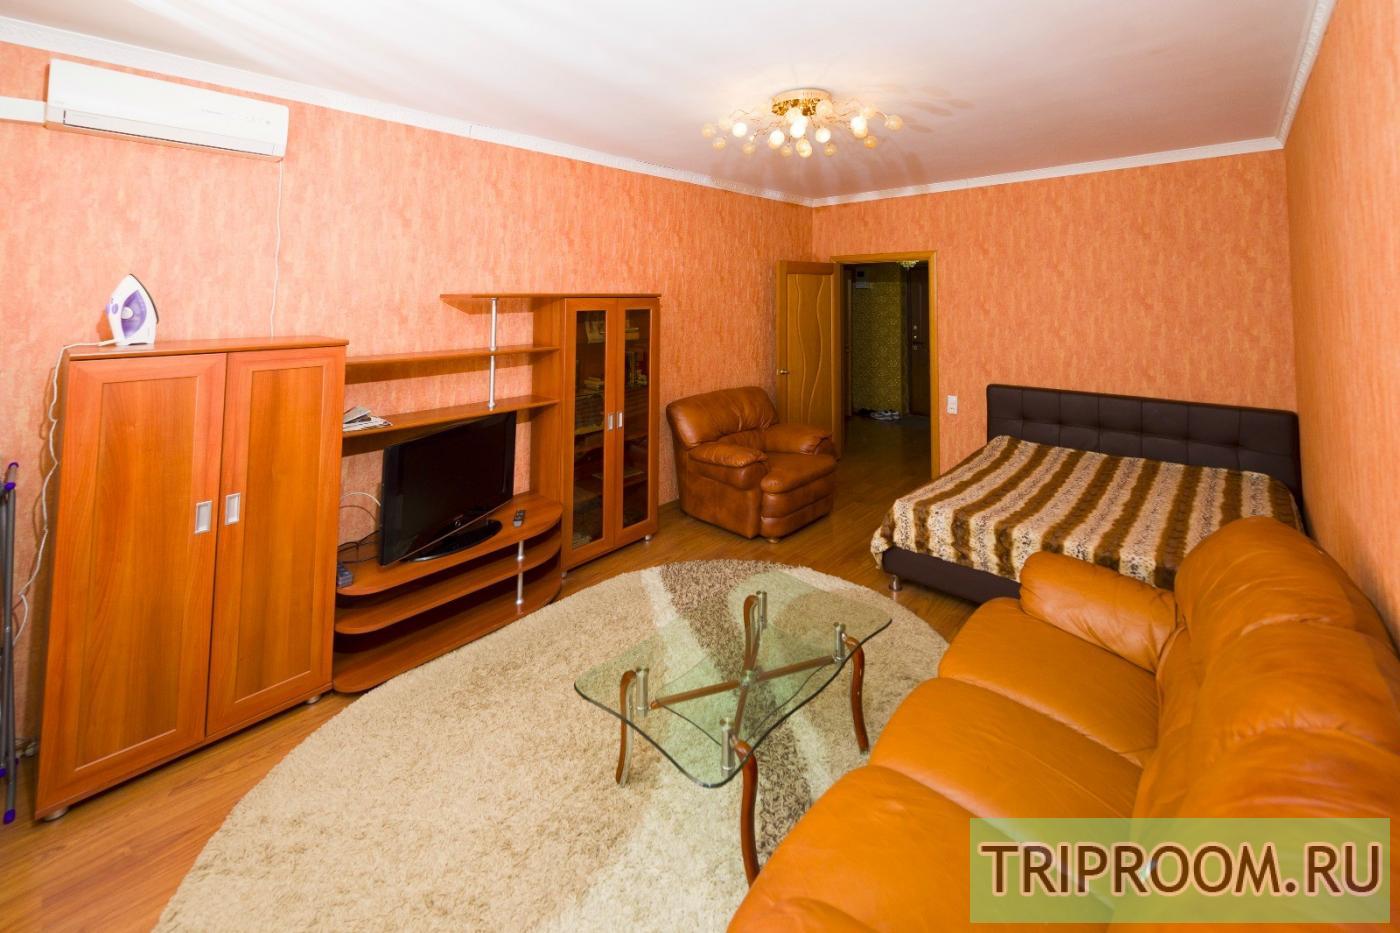 2-комнатная квартира посуточно (вариант № 2850), ул. Габдуллы Тукая улица, фото № 1